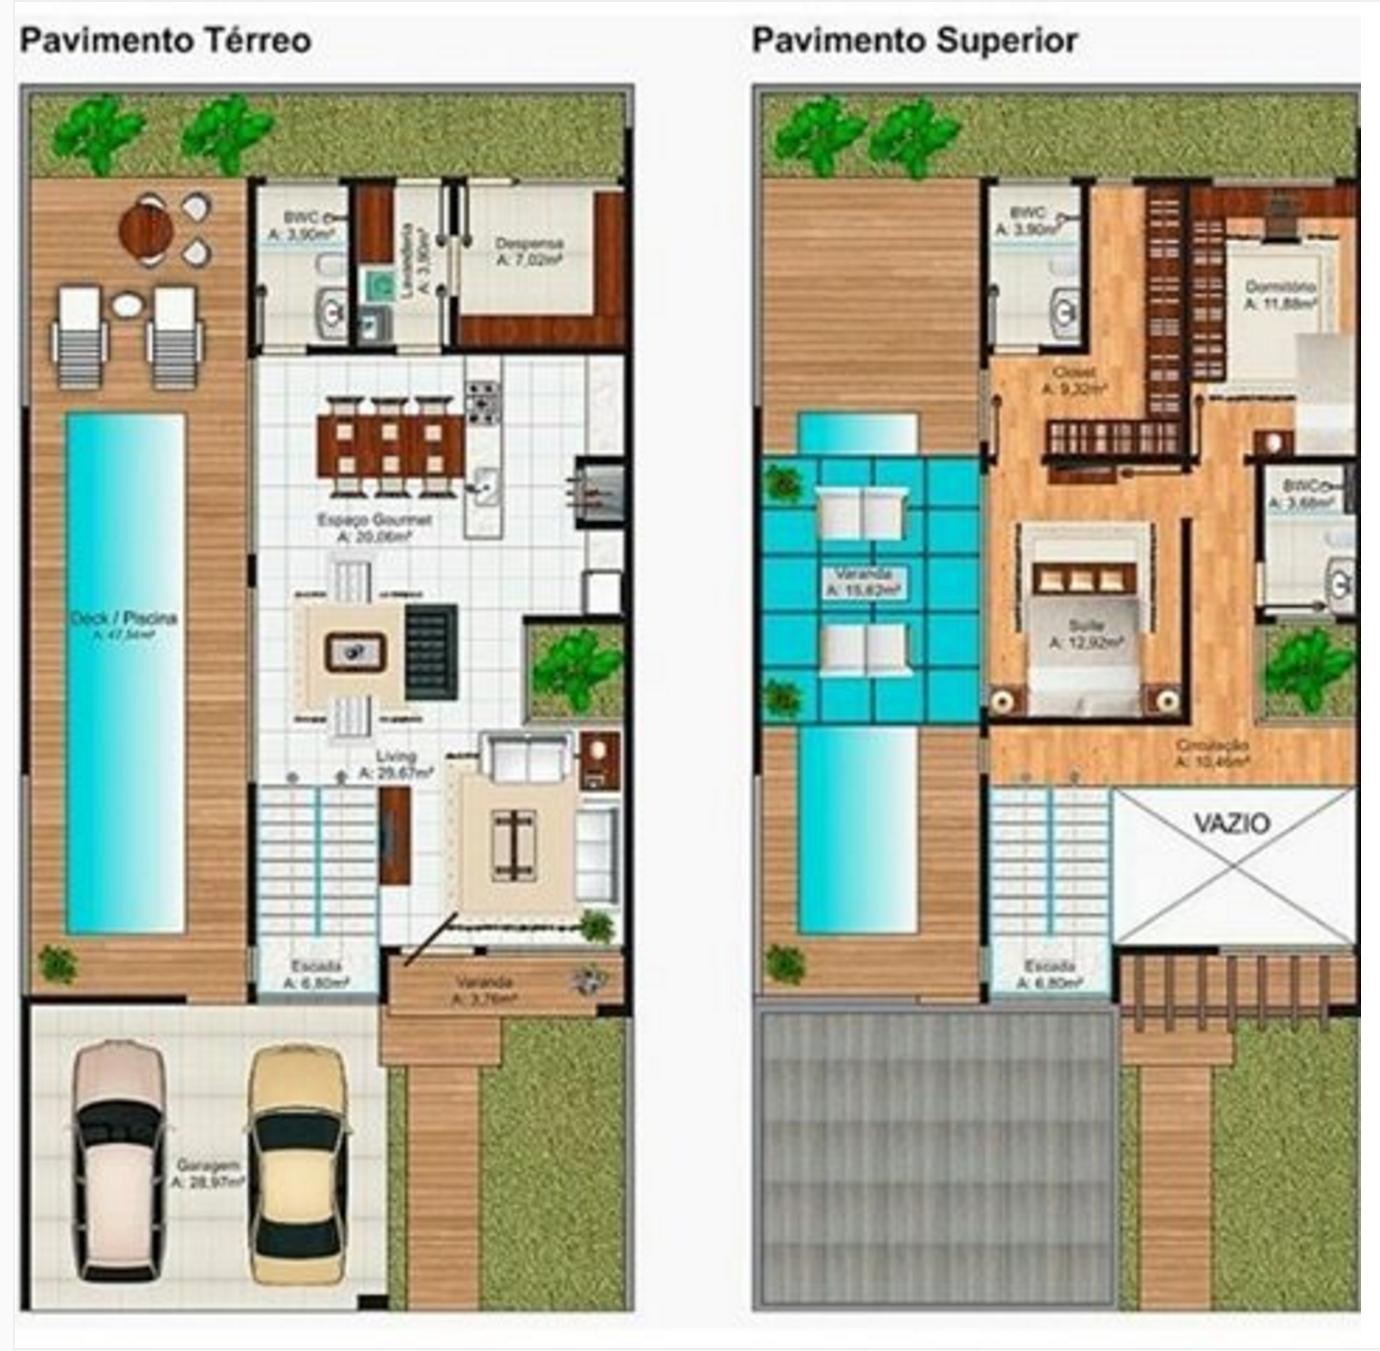 101 planos de casas planos de casas de 2 plantas peque as for Plantas de viviendas